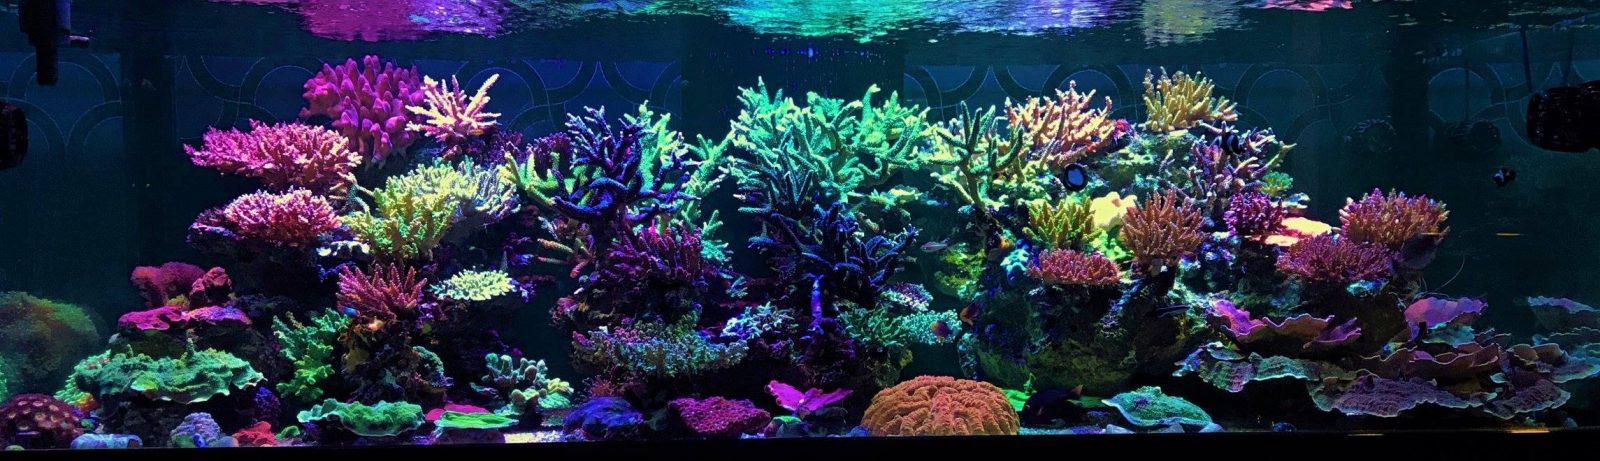 amazong-rif-aquarium-orphek